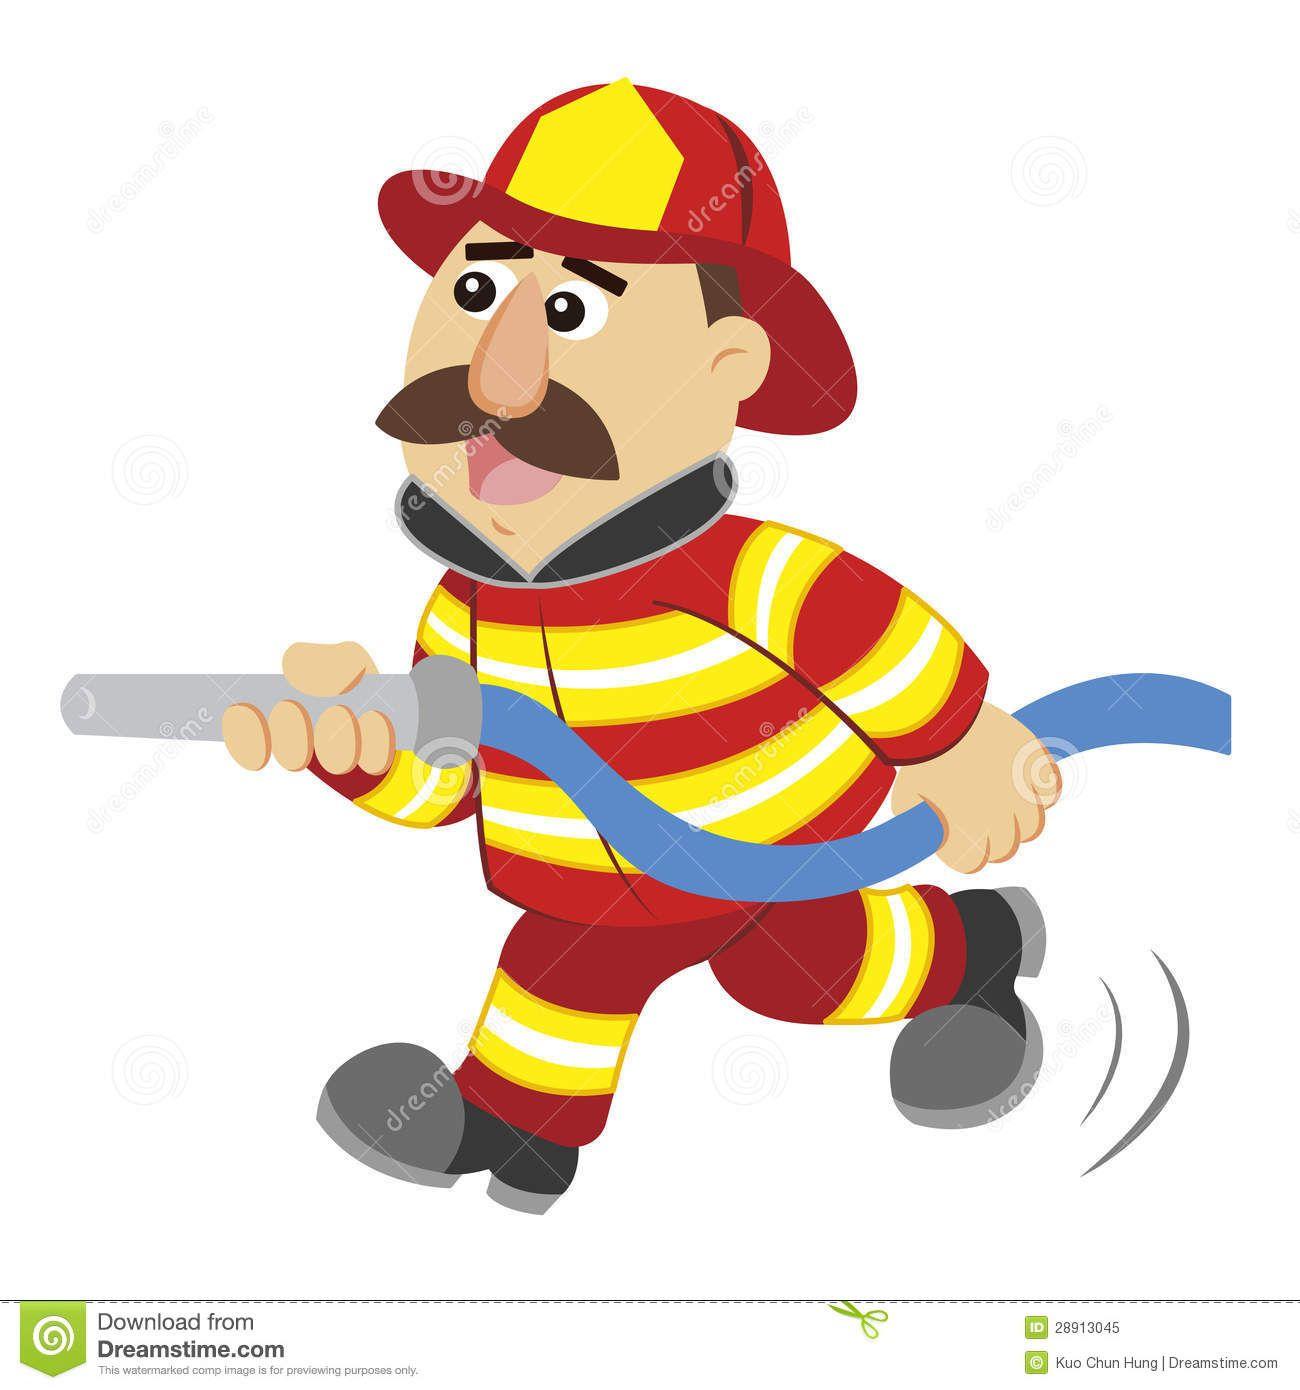 Illustration Cartoon Fireman 28913045 Kids Birthday Cards Fireman Kids Fireman